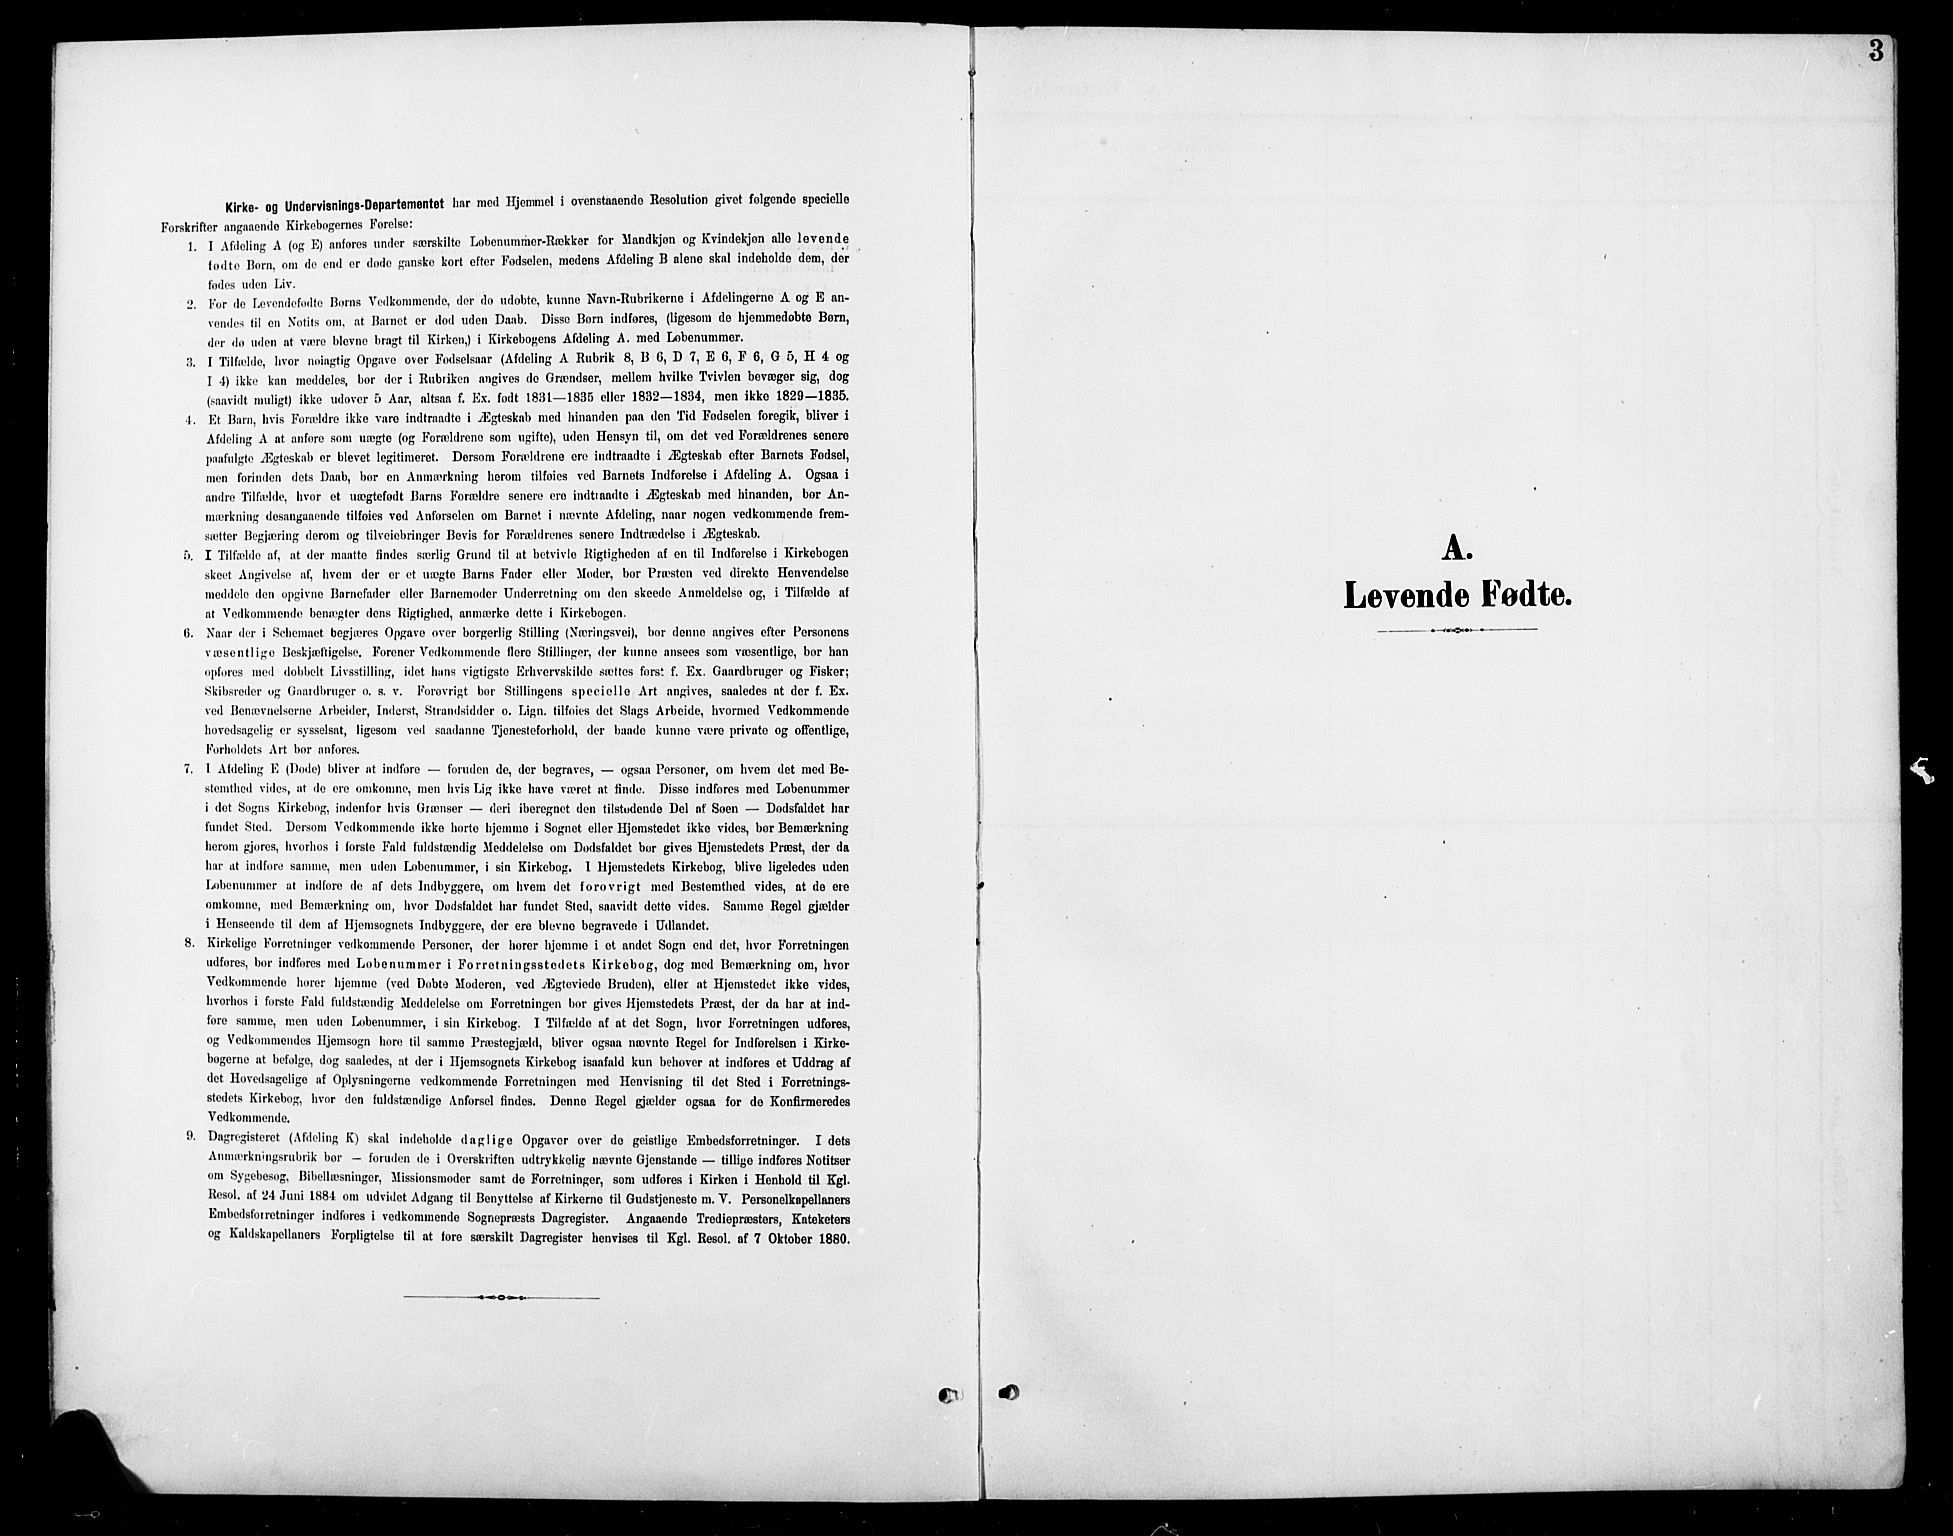 SAH, Vardal prestekontor, H/Ha/Hab/L0012: Klokkerbok nr. 12, 1902-1911, s. 3